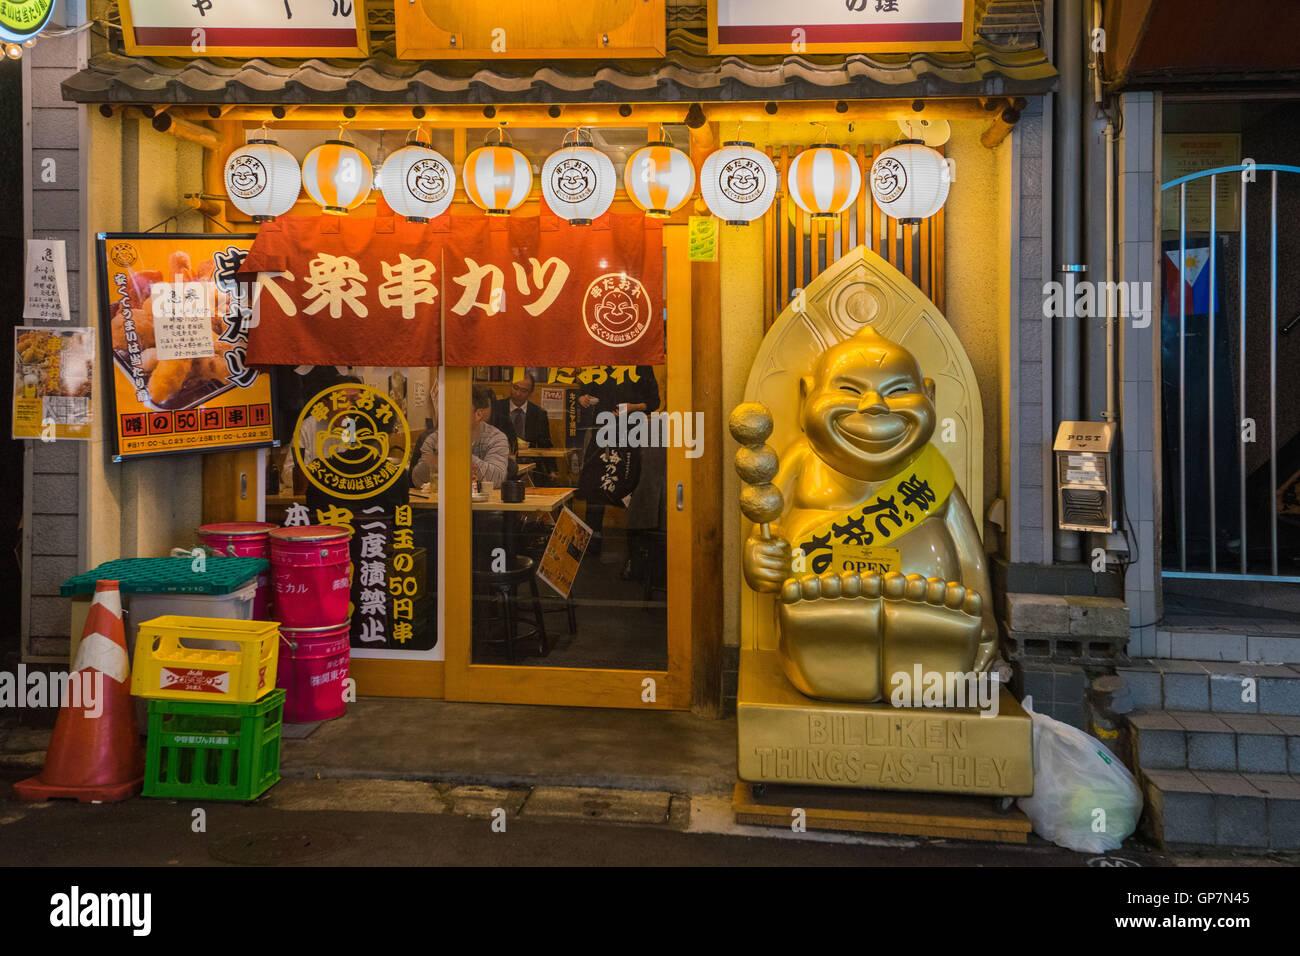 Japanese restaurant in lane of suburb, tokyo, japan - Stock Image